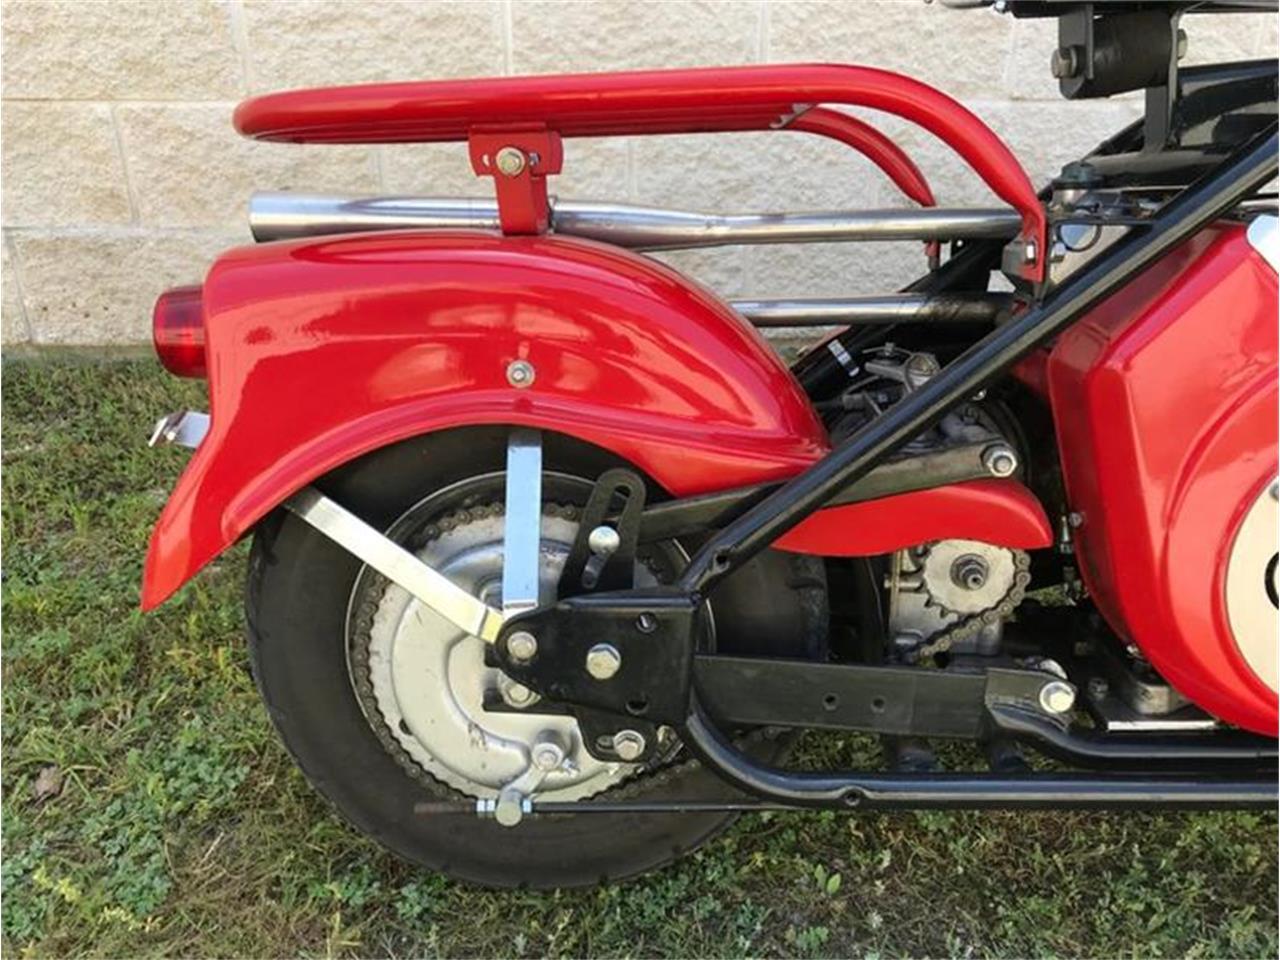 1963 Cushman Motorcycle (CC-1205041) for sale in Fredericksburg, Texas